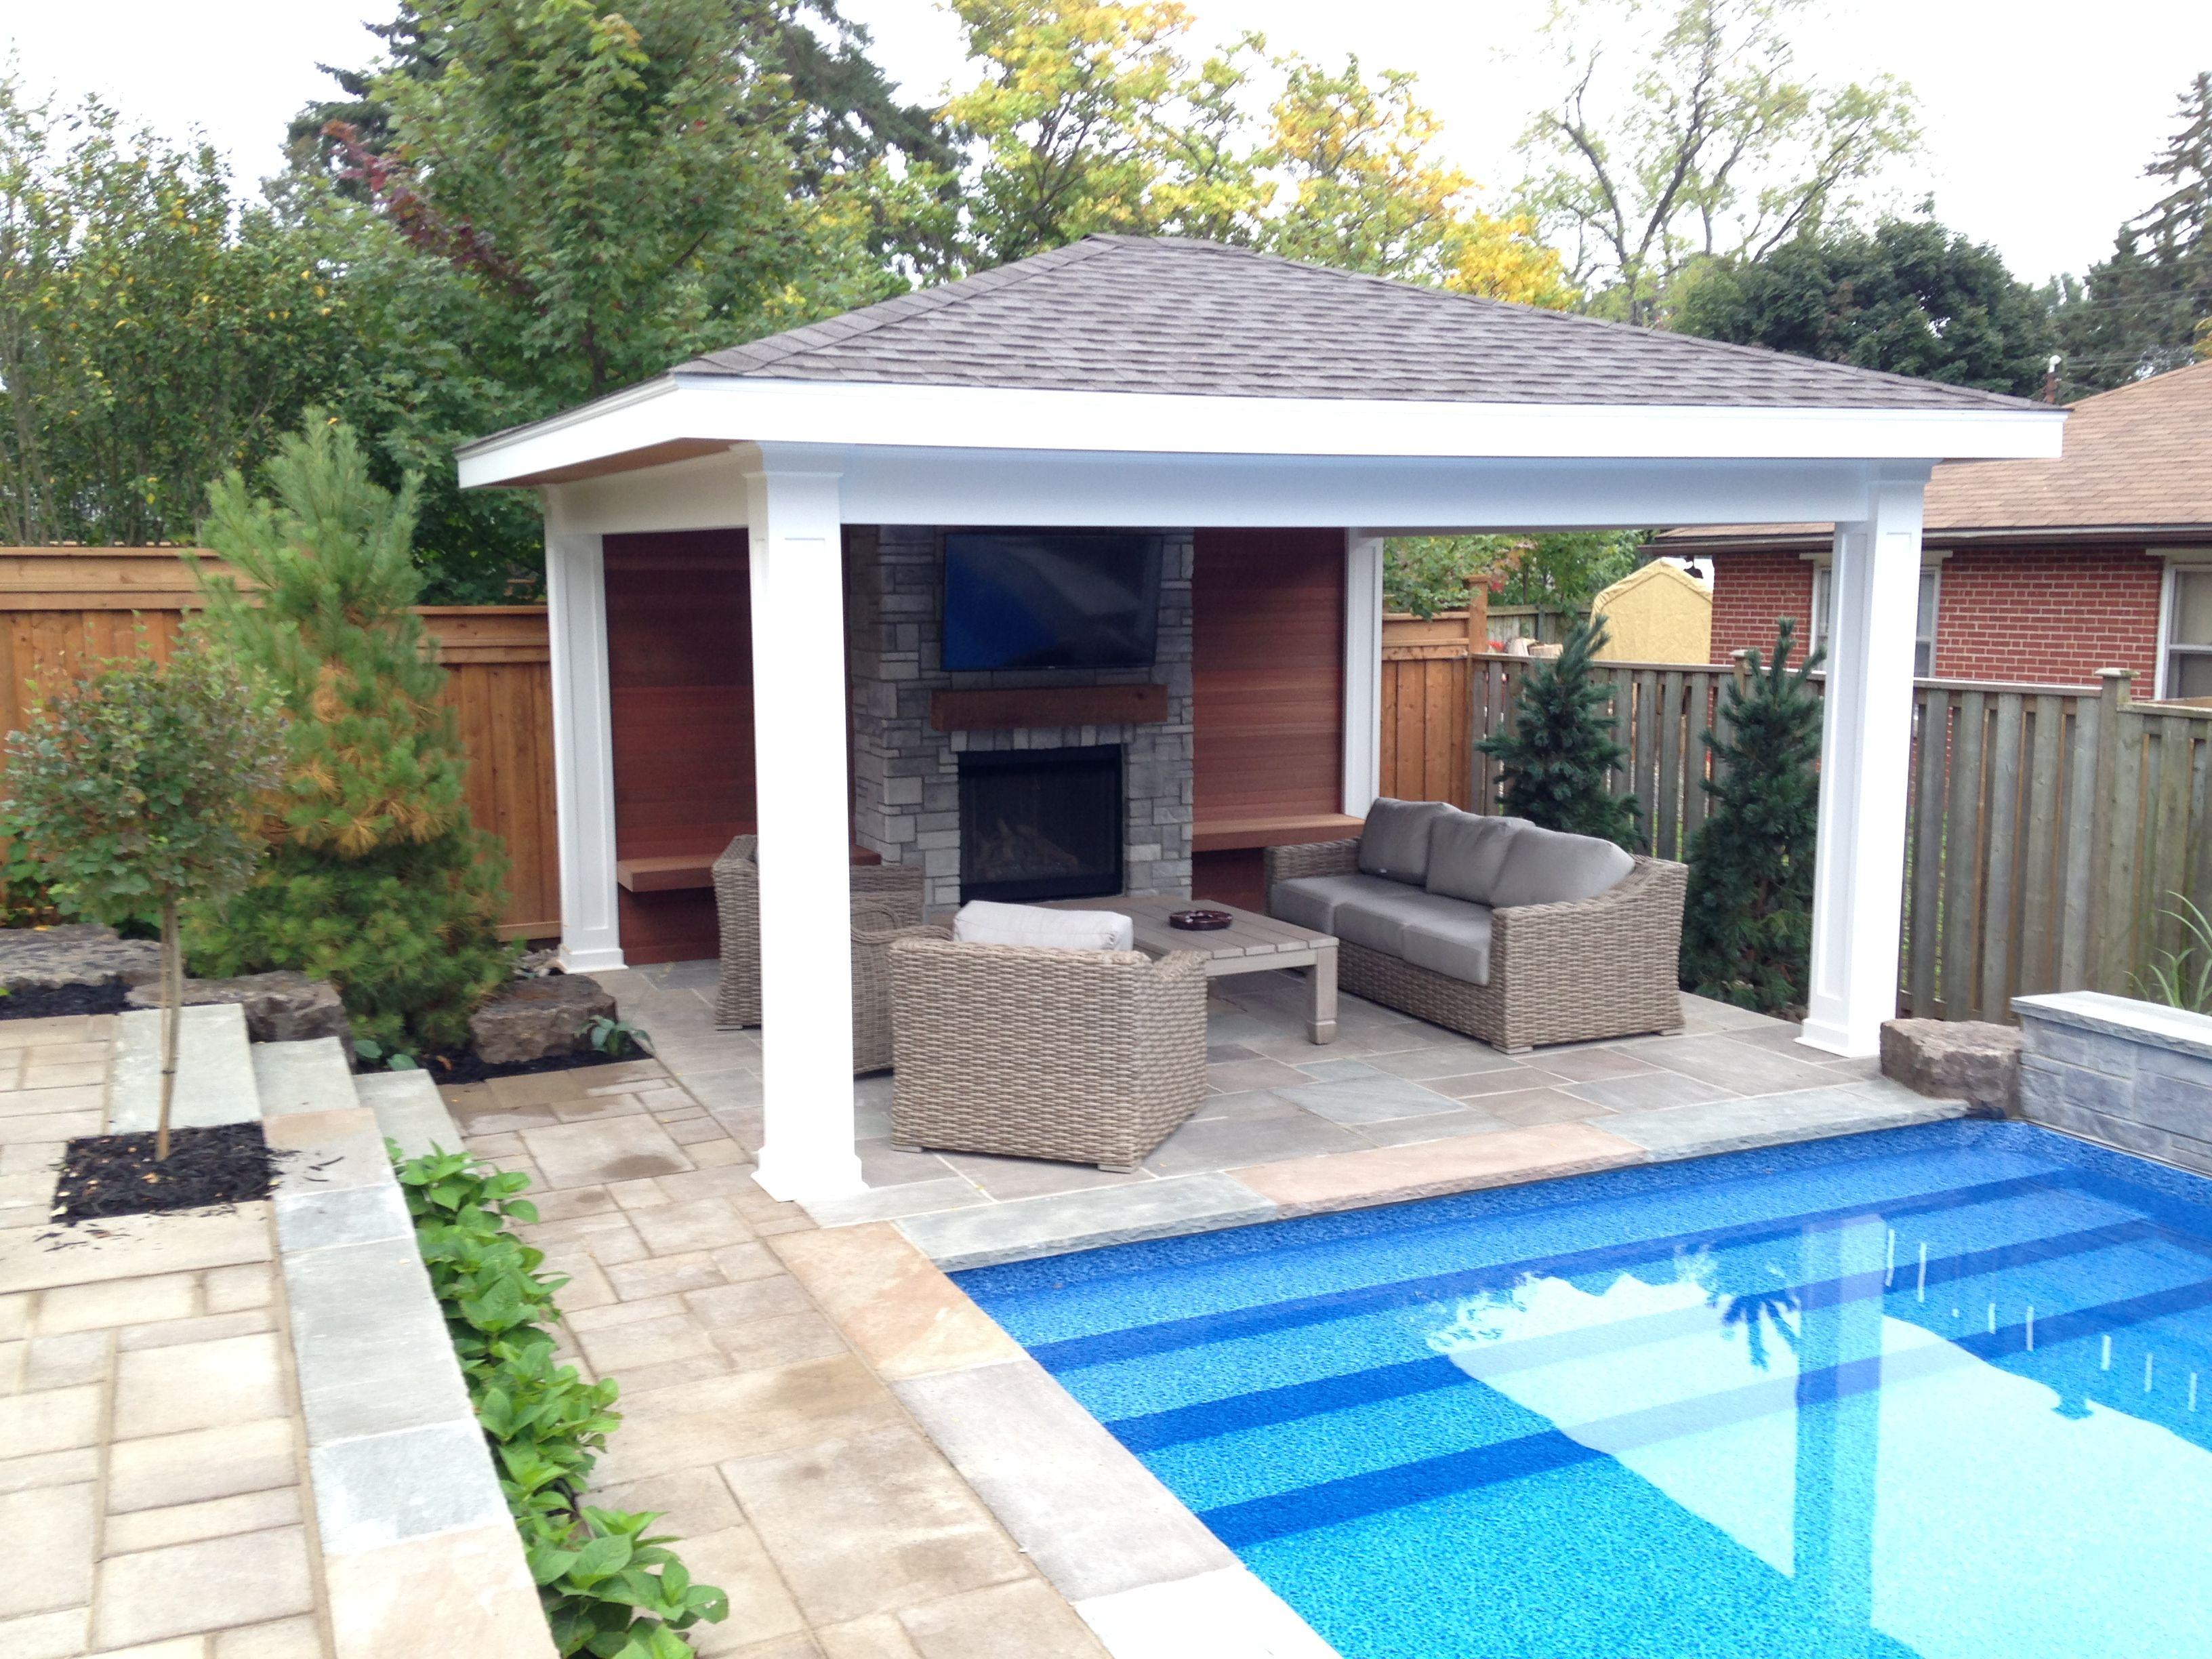 Poolside pavilion/ pool house featuring fireplace. Kayu